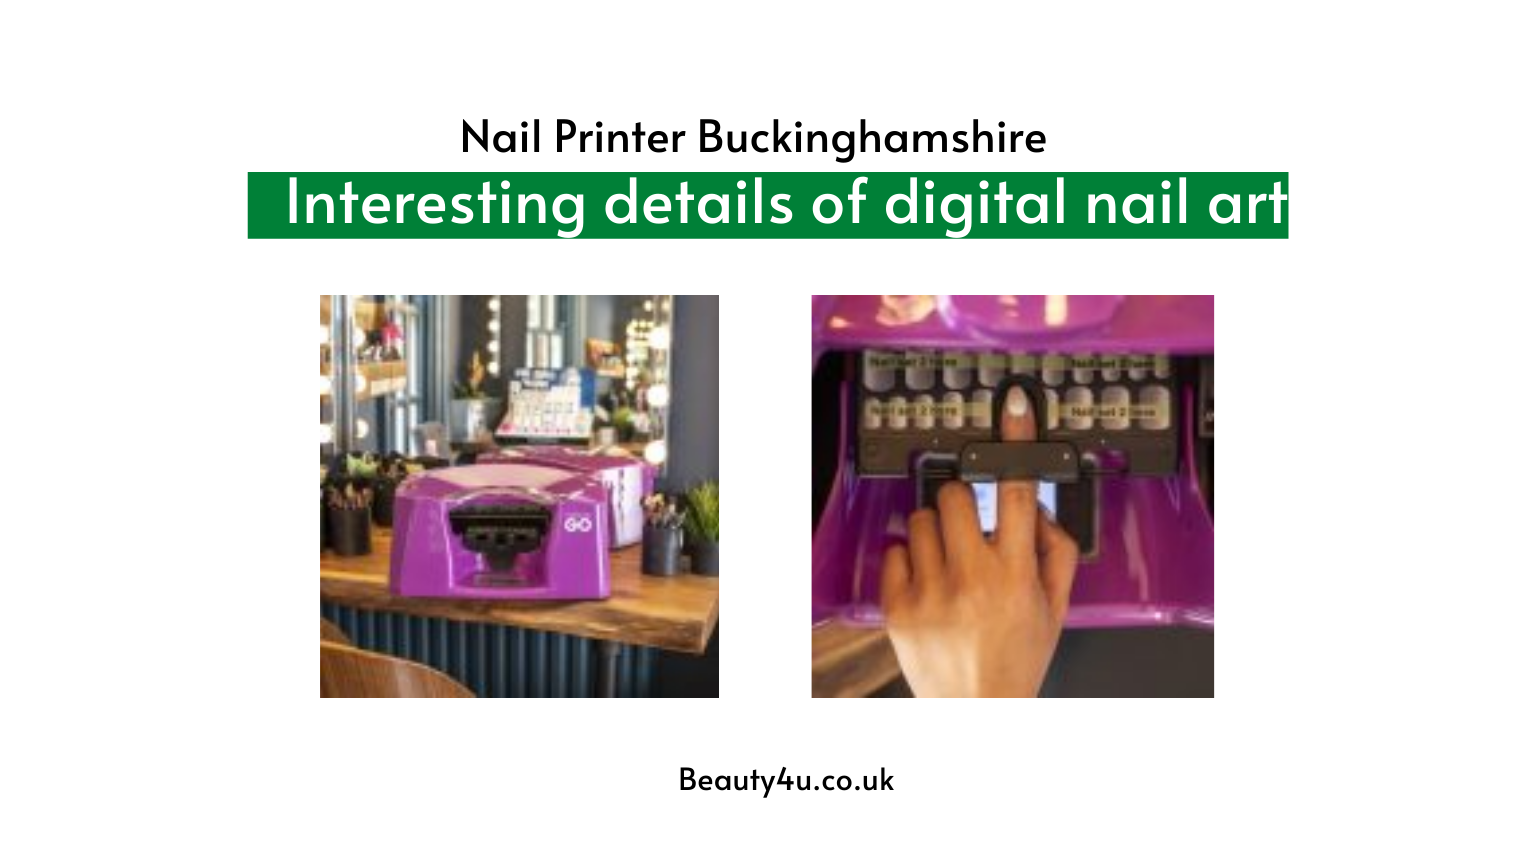 Nail Printer Buckinghamshire